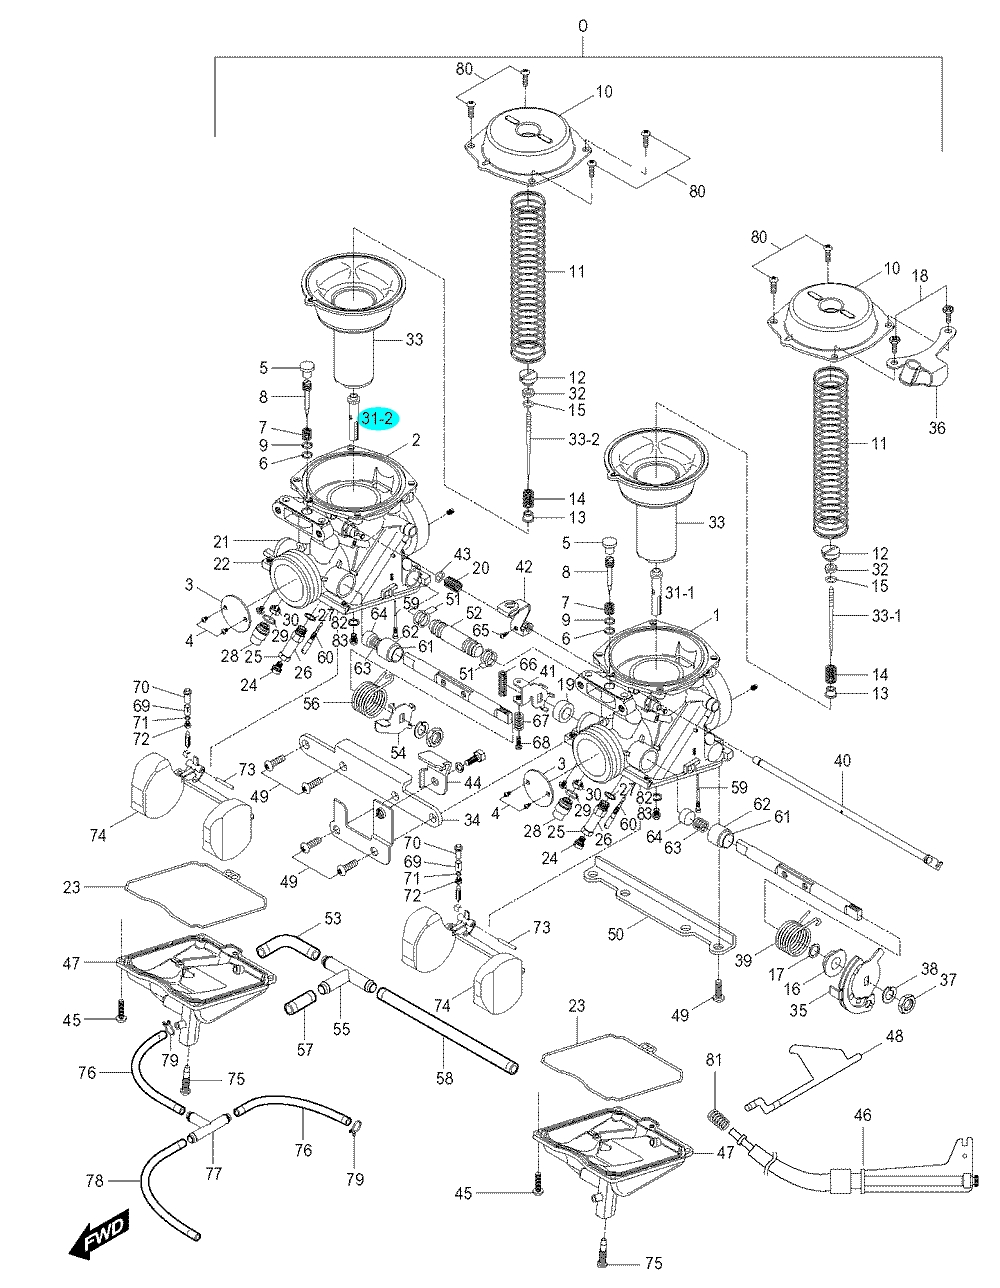 [31-2] Ventil jehlový (karburátor) - Hyosung GV 250